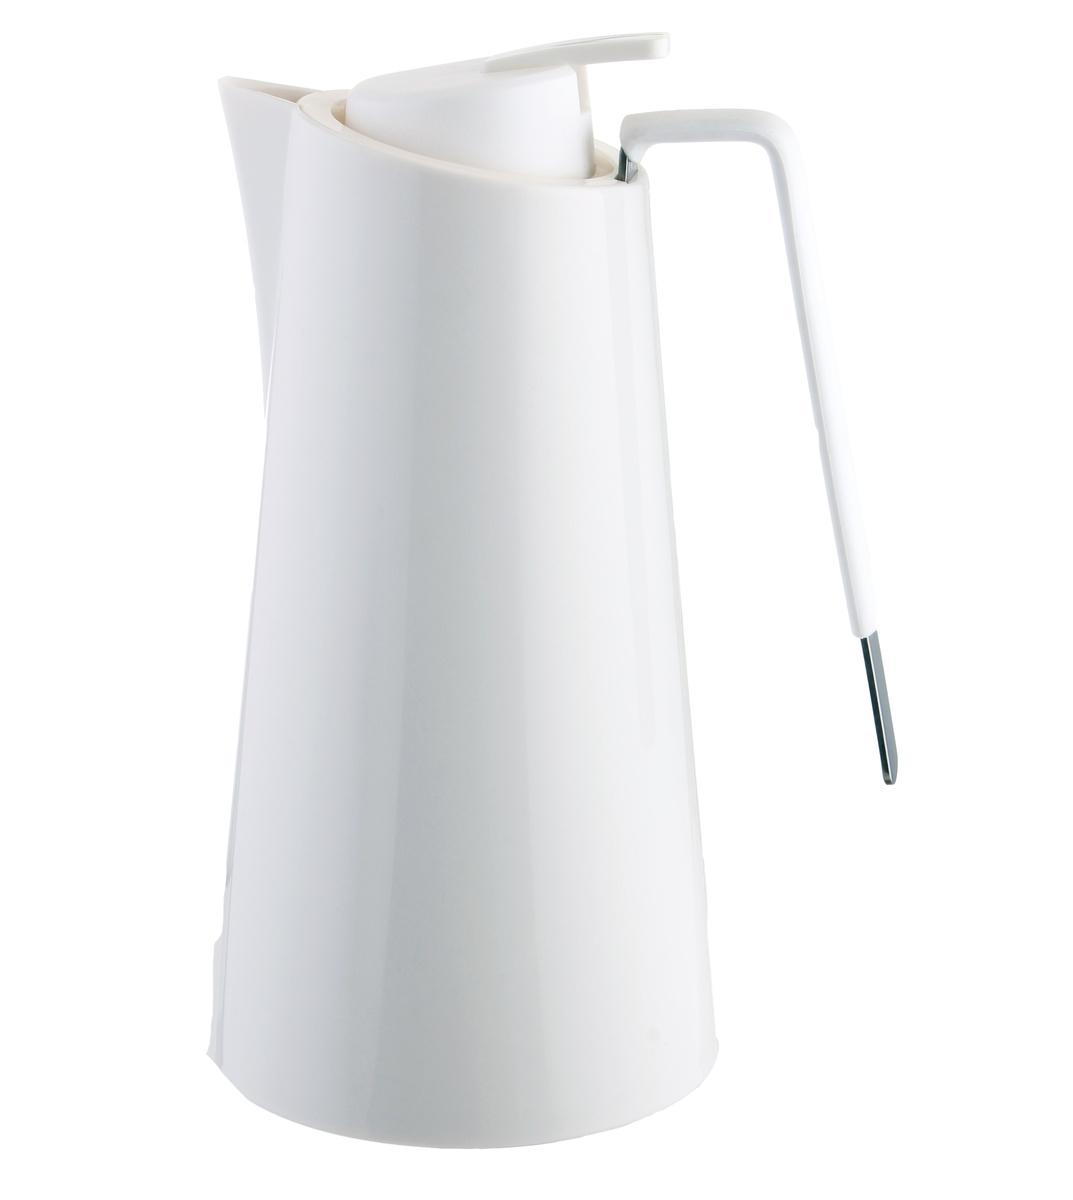 Florina Konferenčná termoska 1,5l, biela,